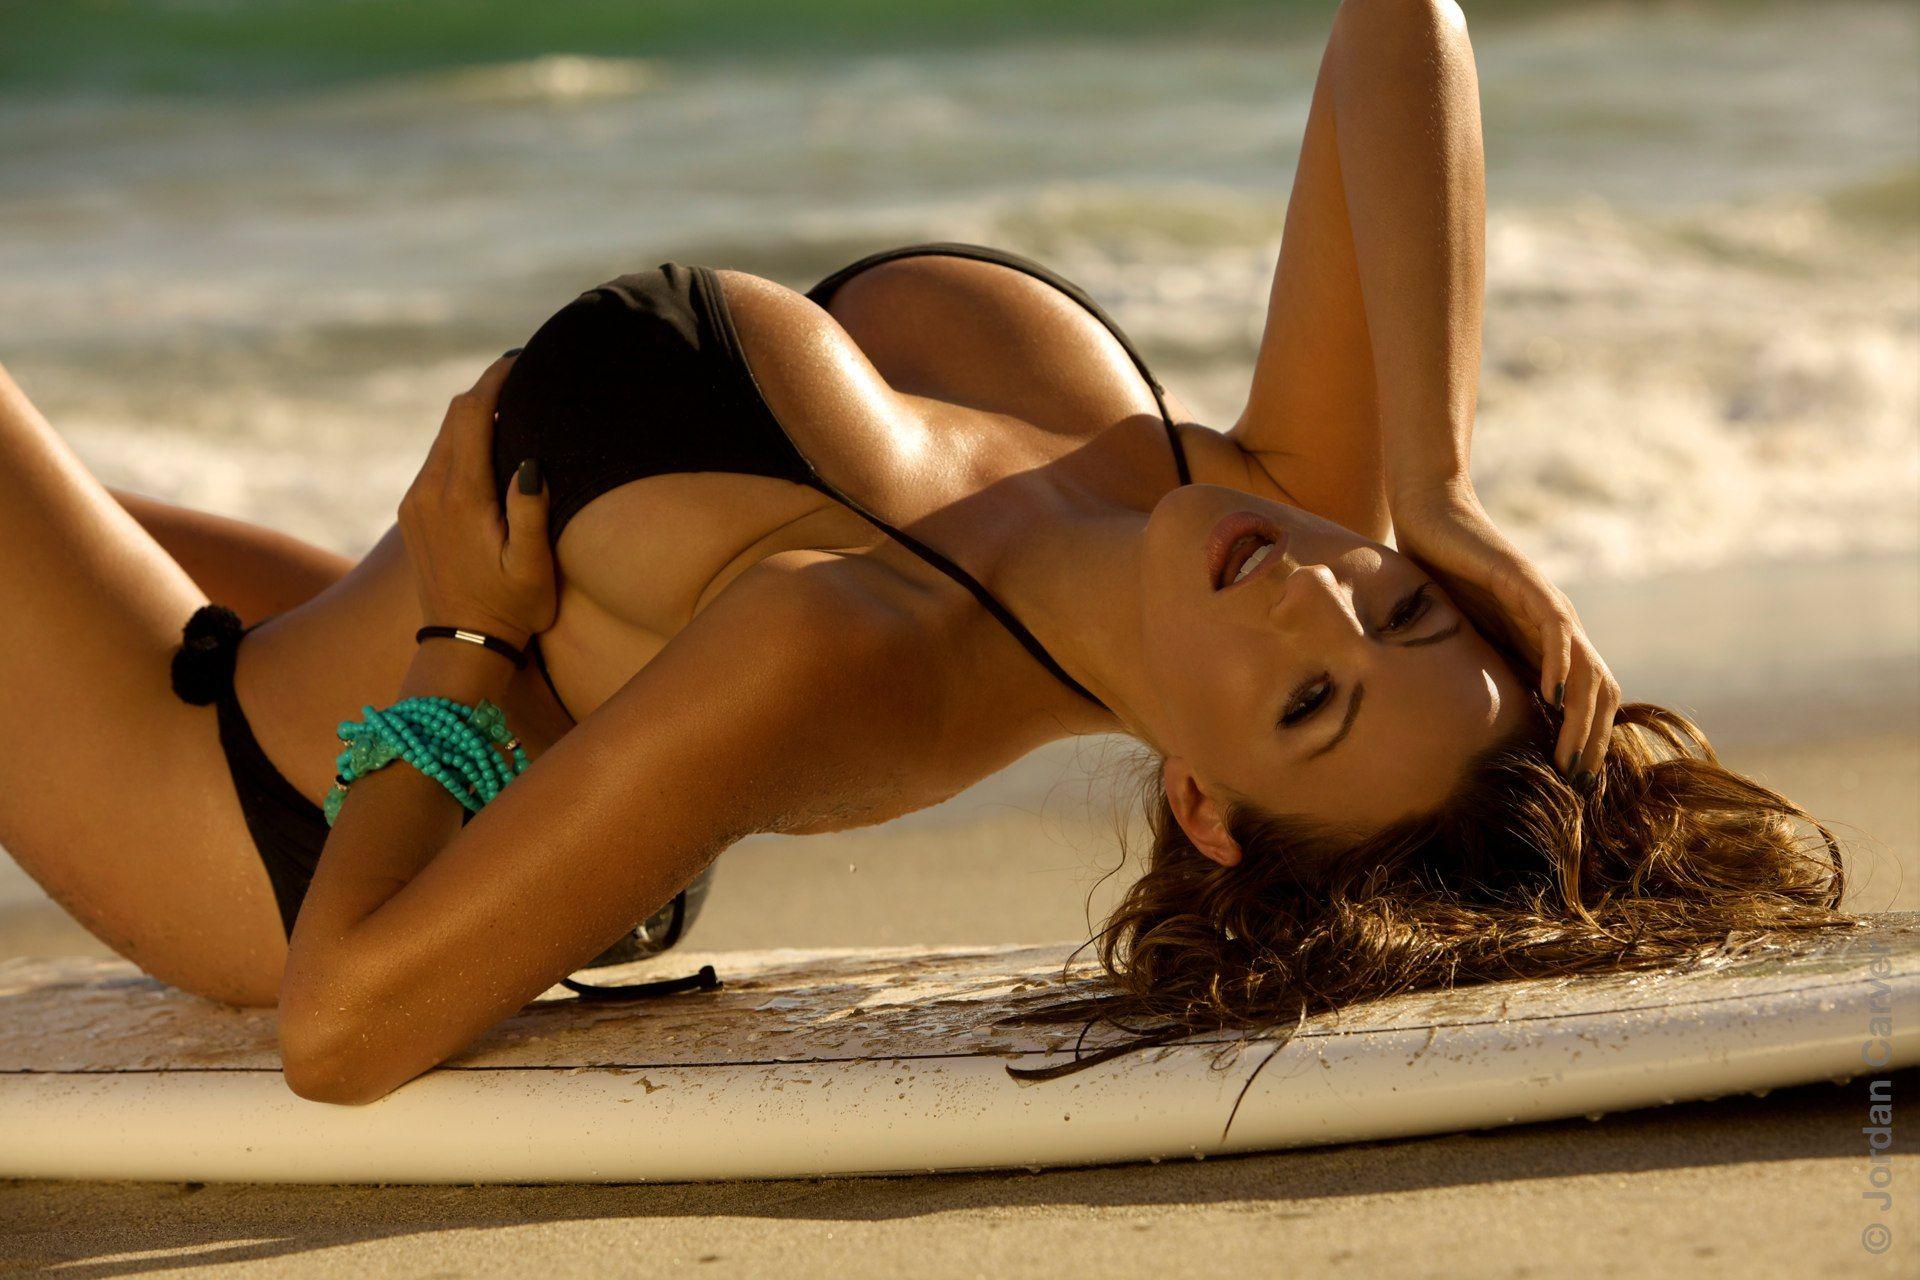 Bikini hot pictures porno latinas